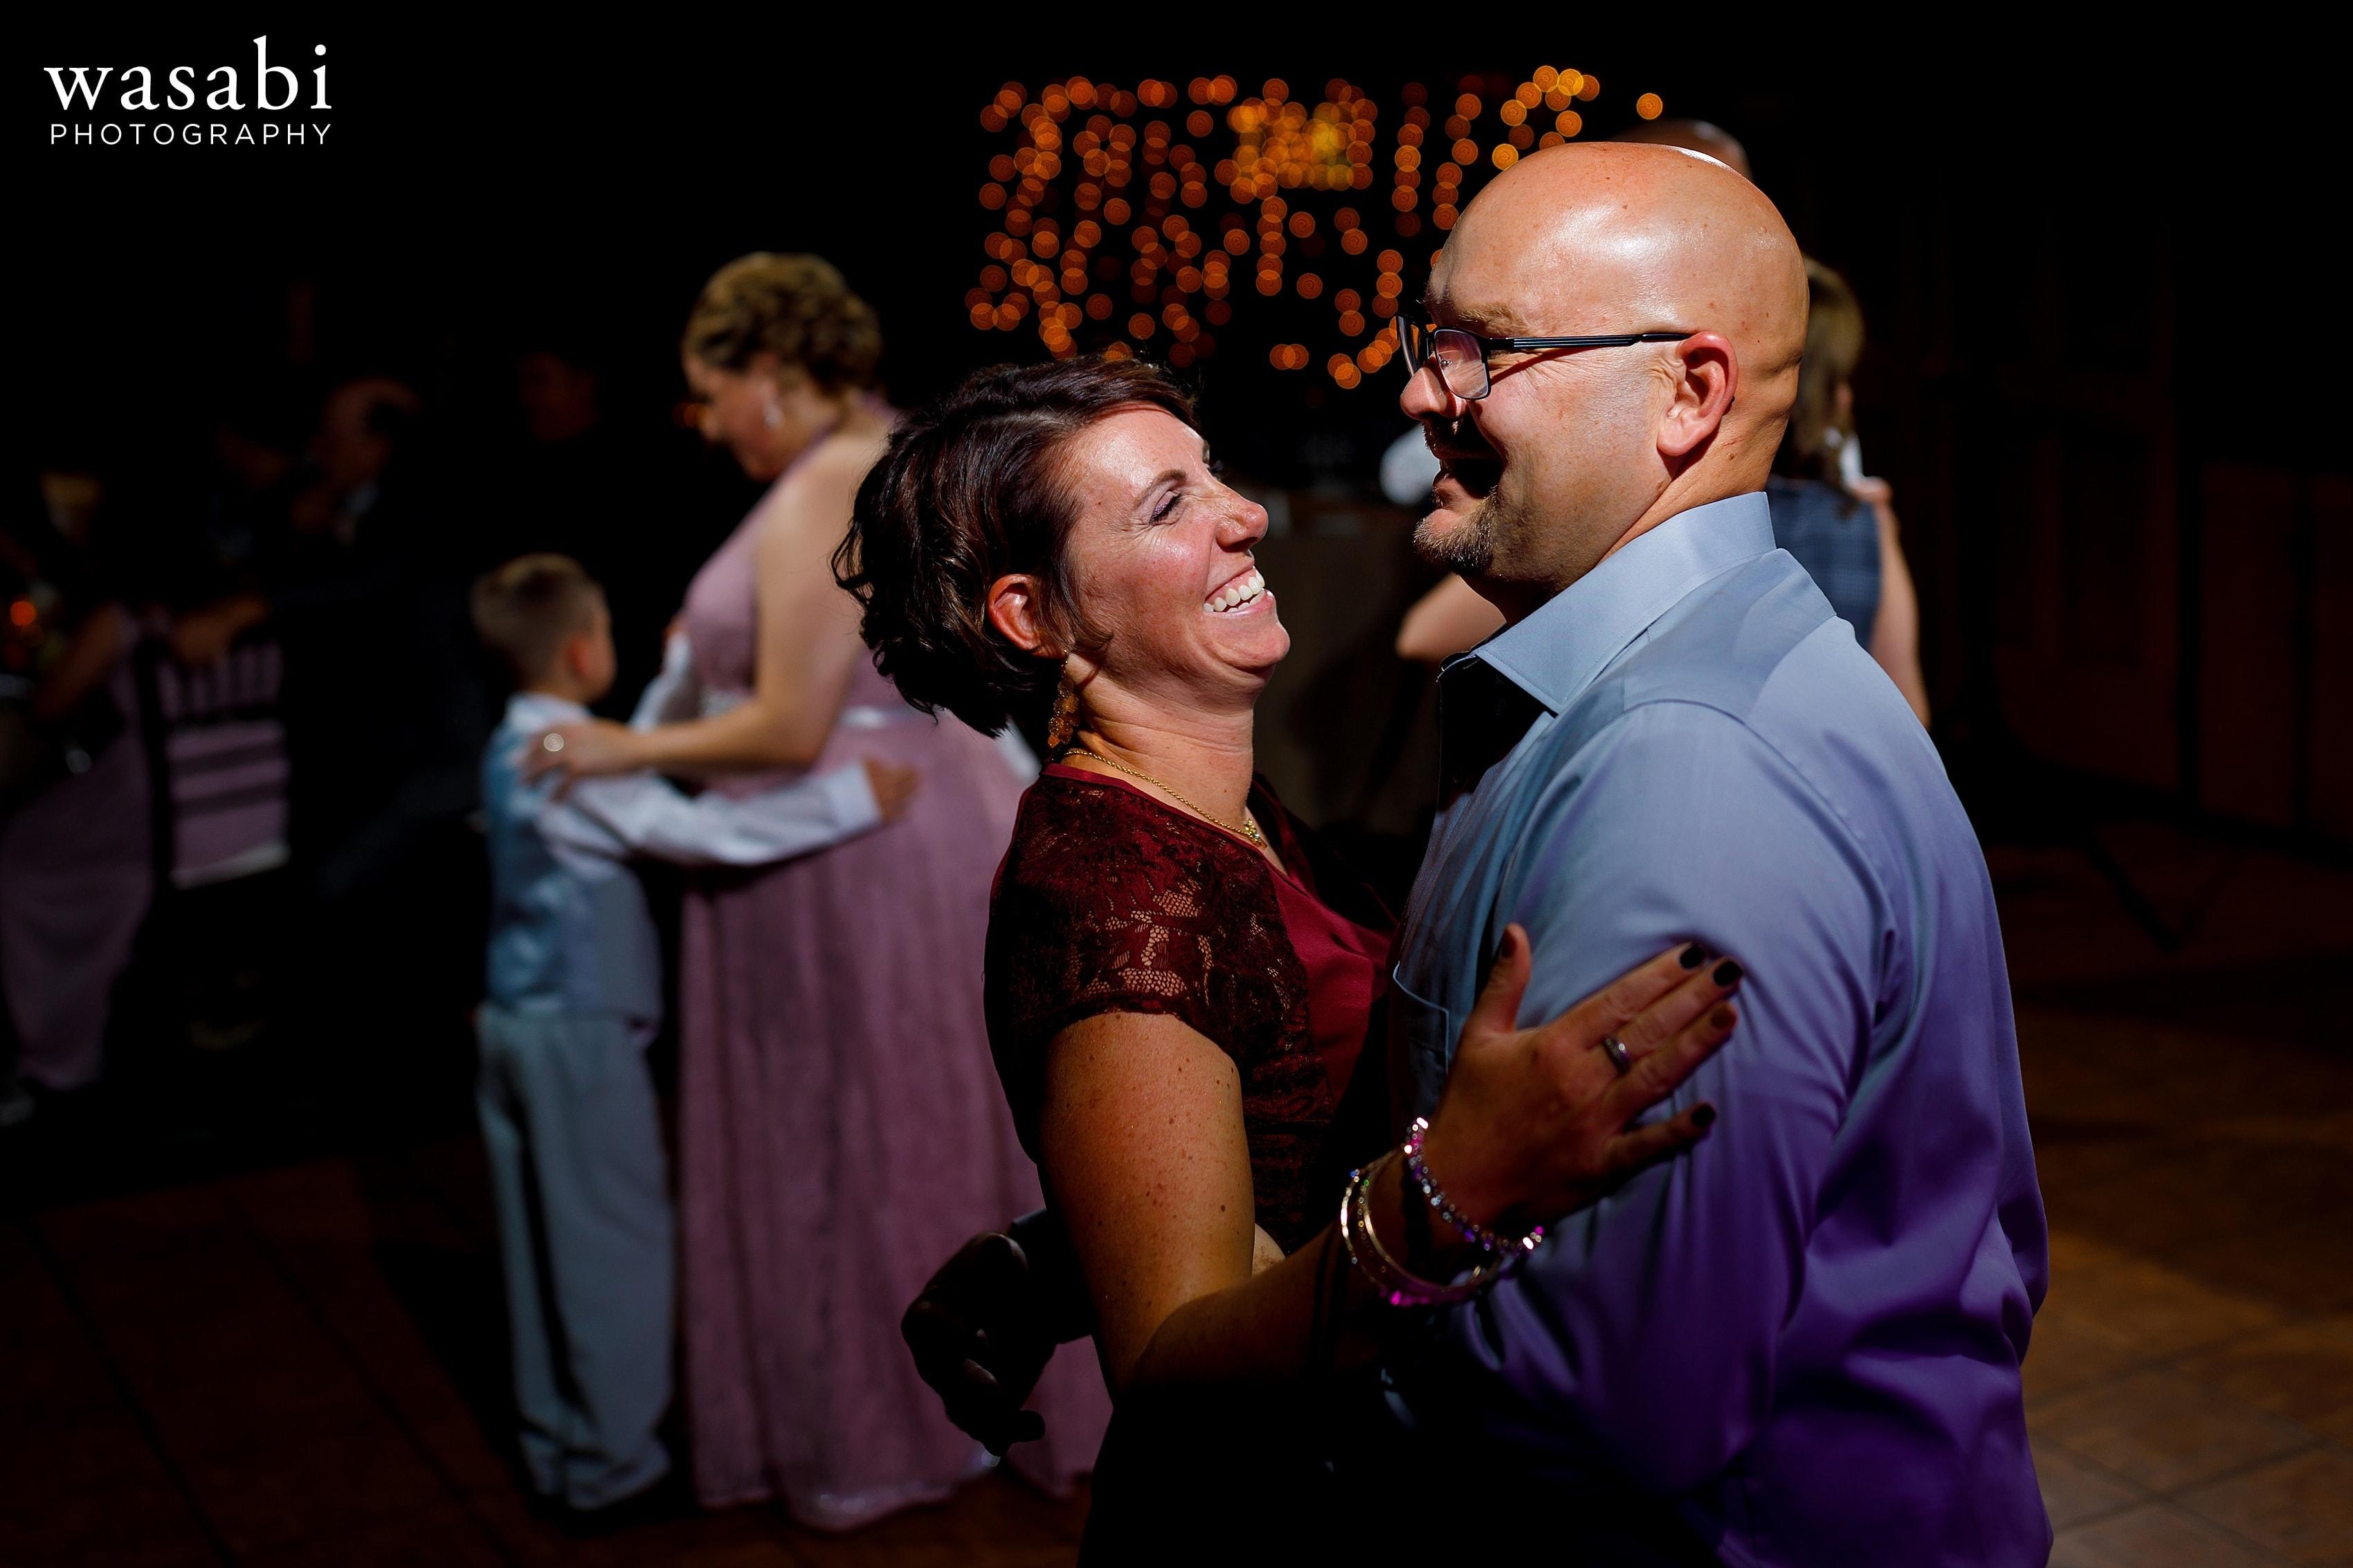 Wedding guests on the dance floor during Buck's Run Golf Club wedding reception in Mount Pleasant, Michigan.